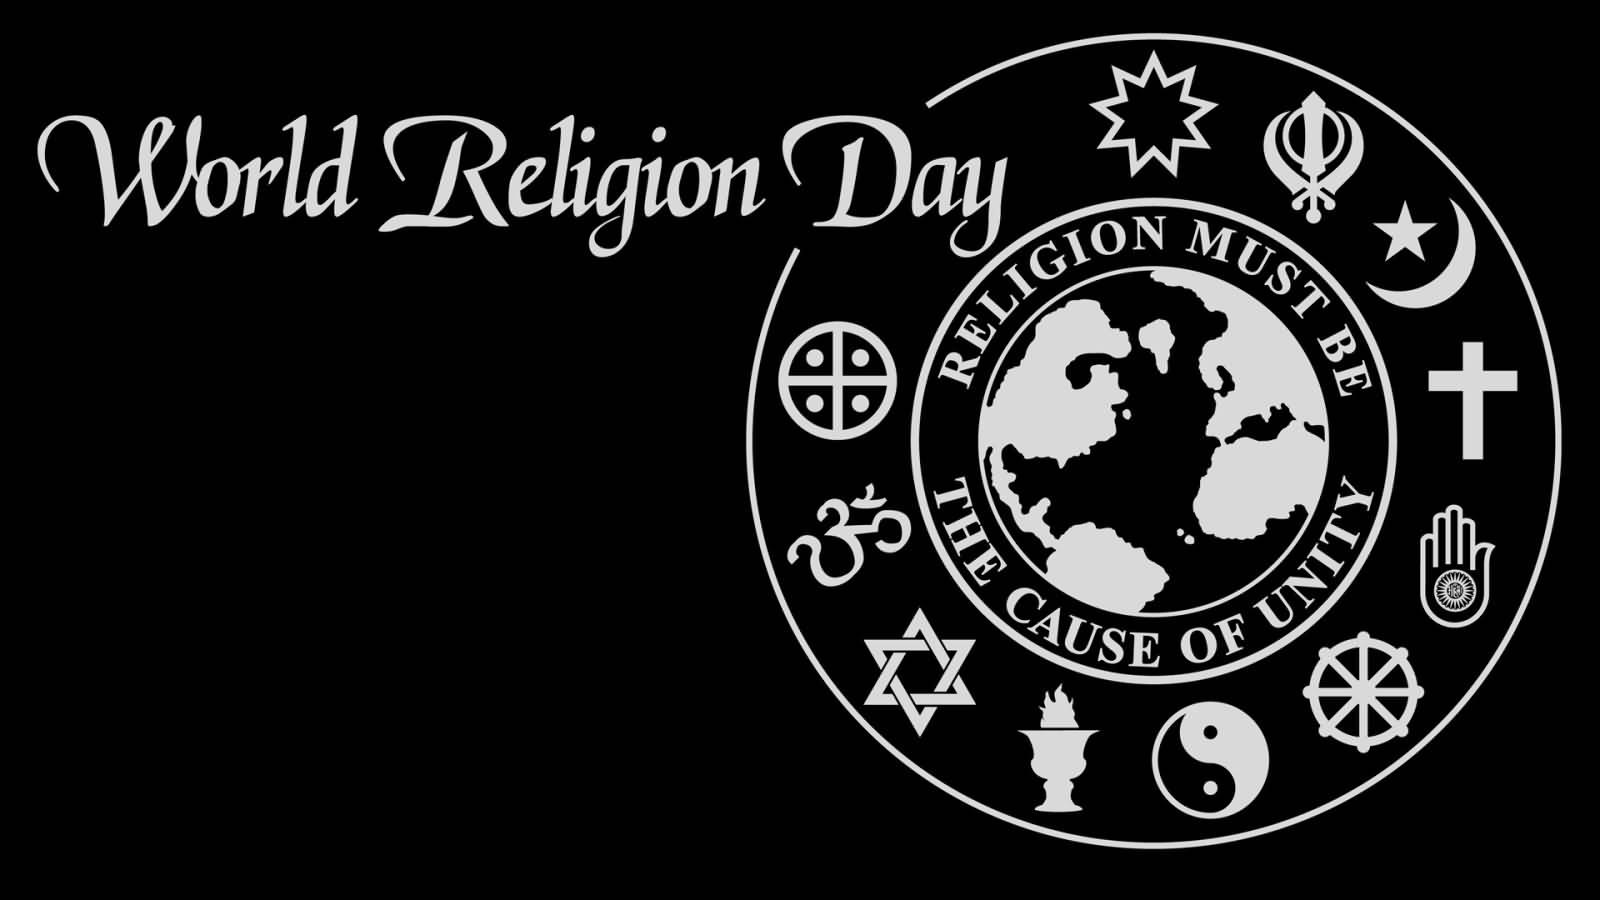 World Religion Day Symbols Of Religions Message Envelope